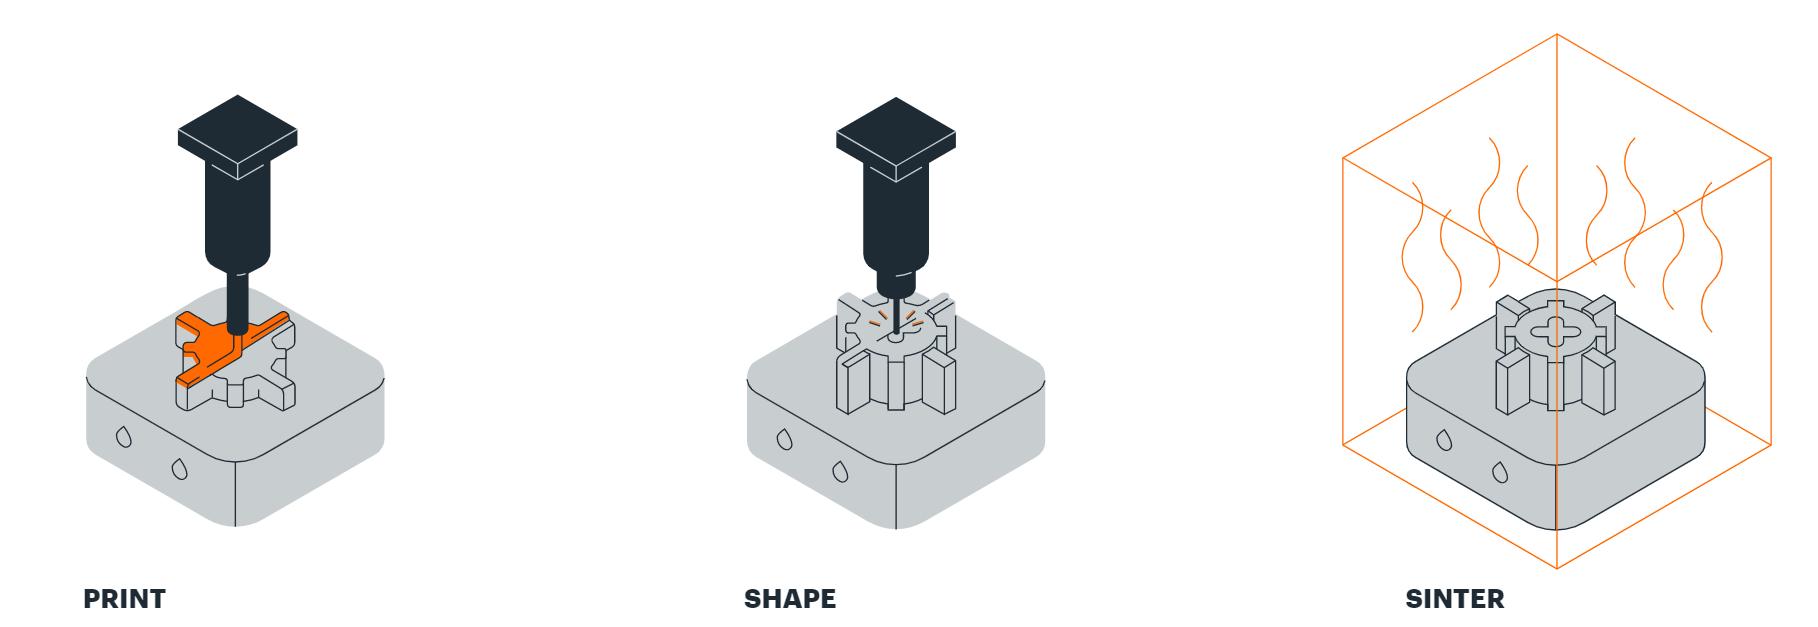 The TrueShape 3D printing process. Image via Mantle.